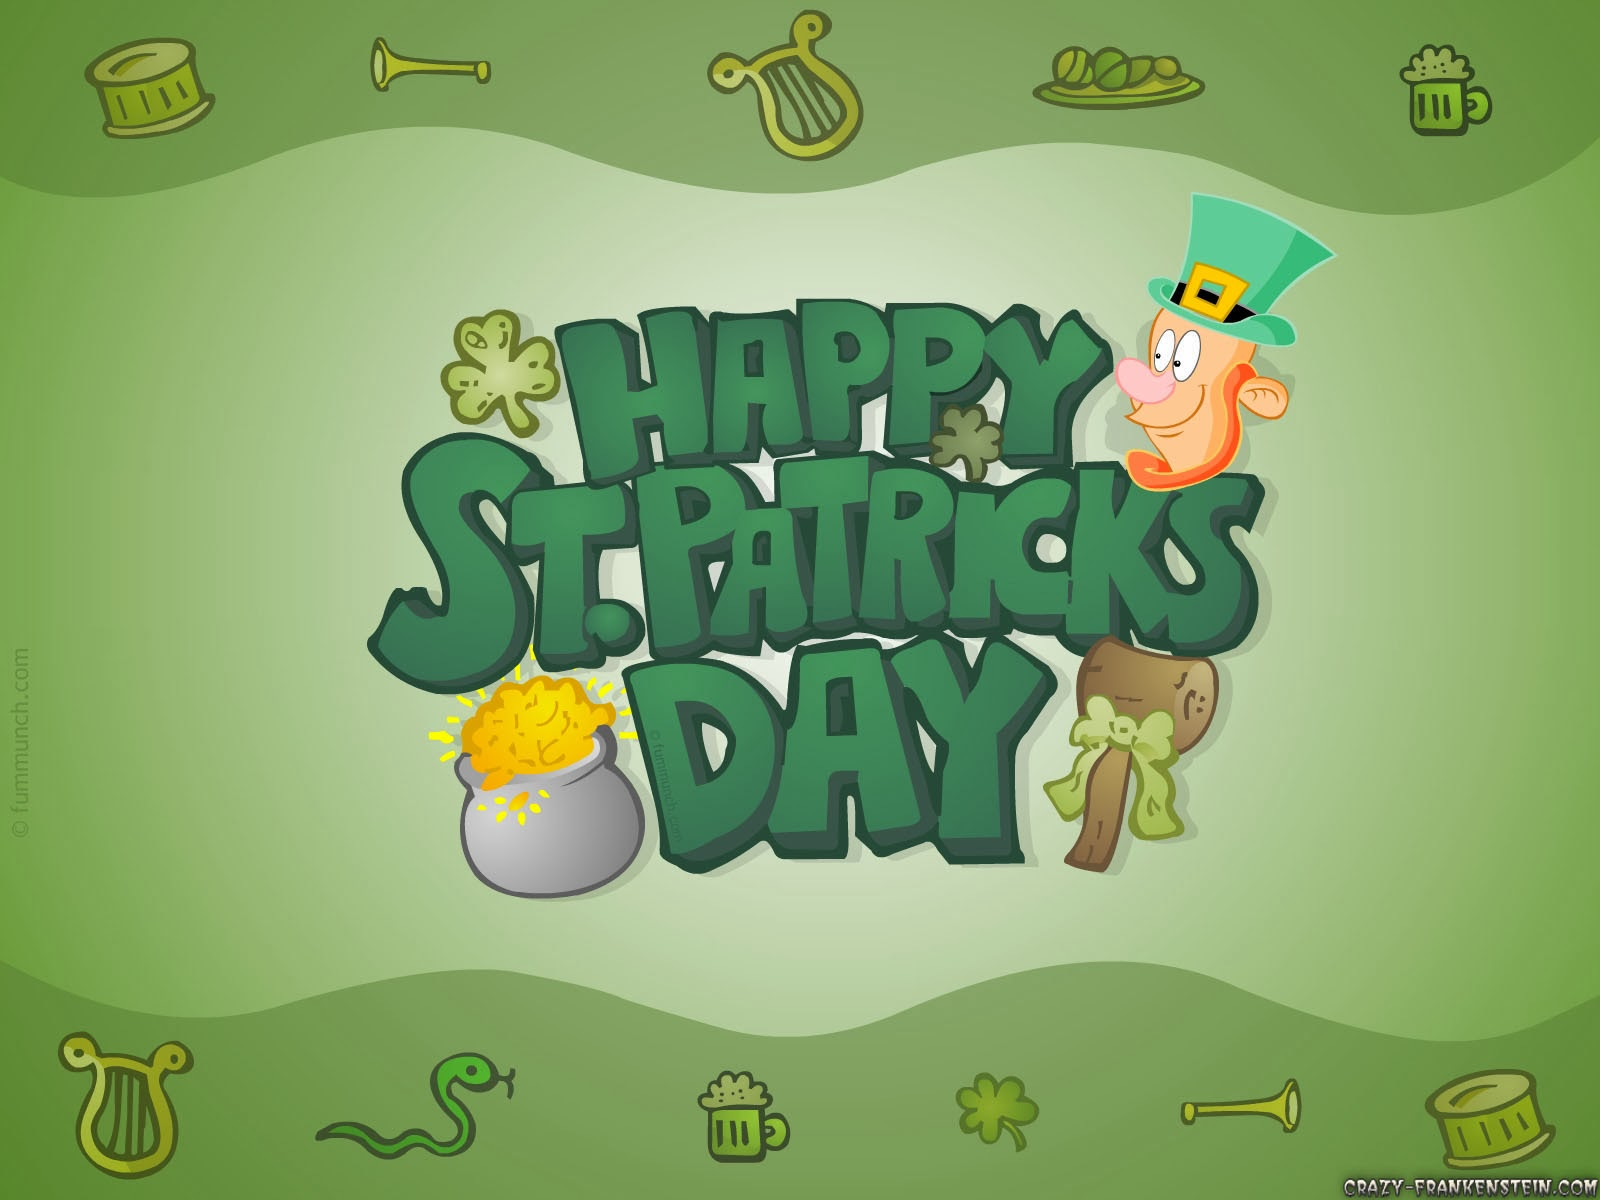 Happy Saint Patrick's Day, part 2